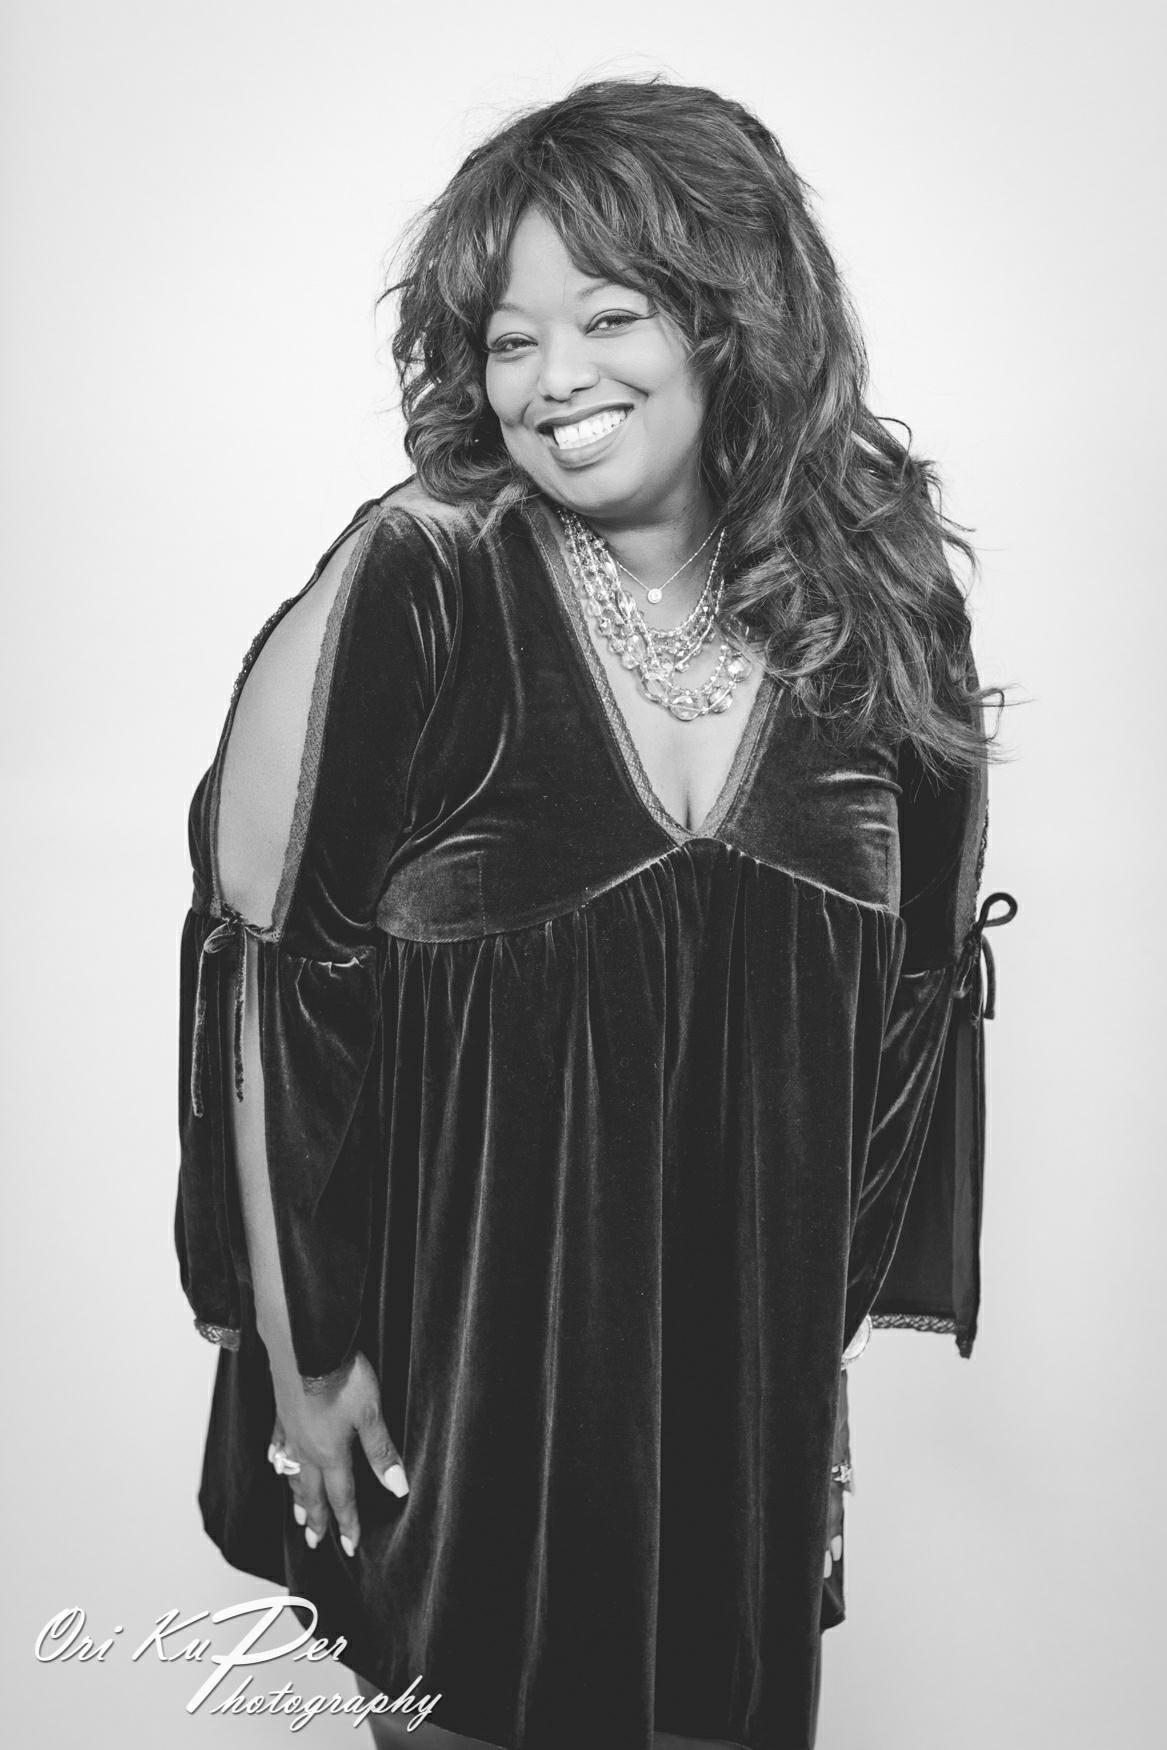 headshots portraits personal branding Houston photographer Ori Kuper 006 IMG_6487_www.HOUVideographe